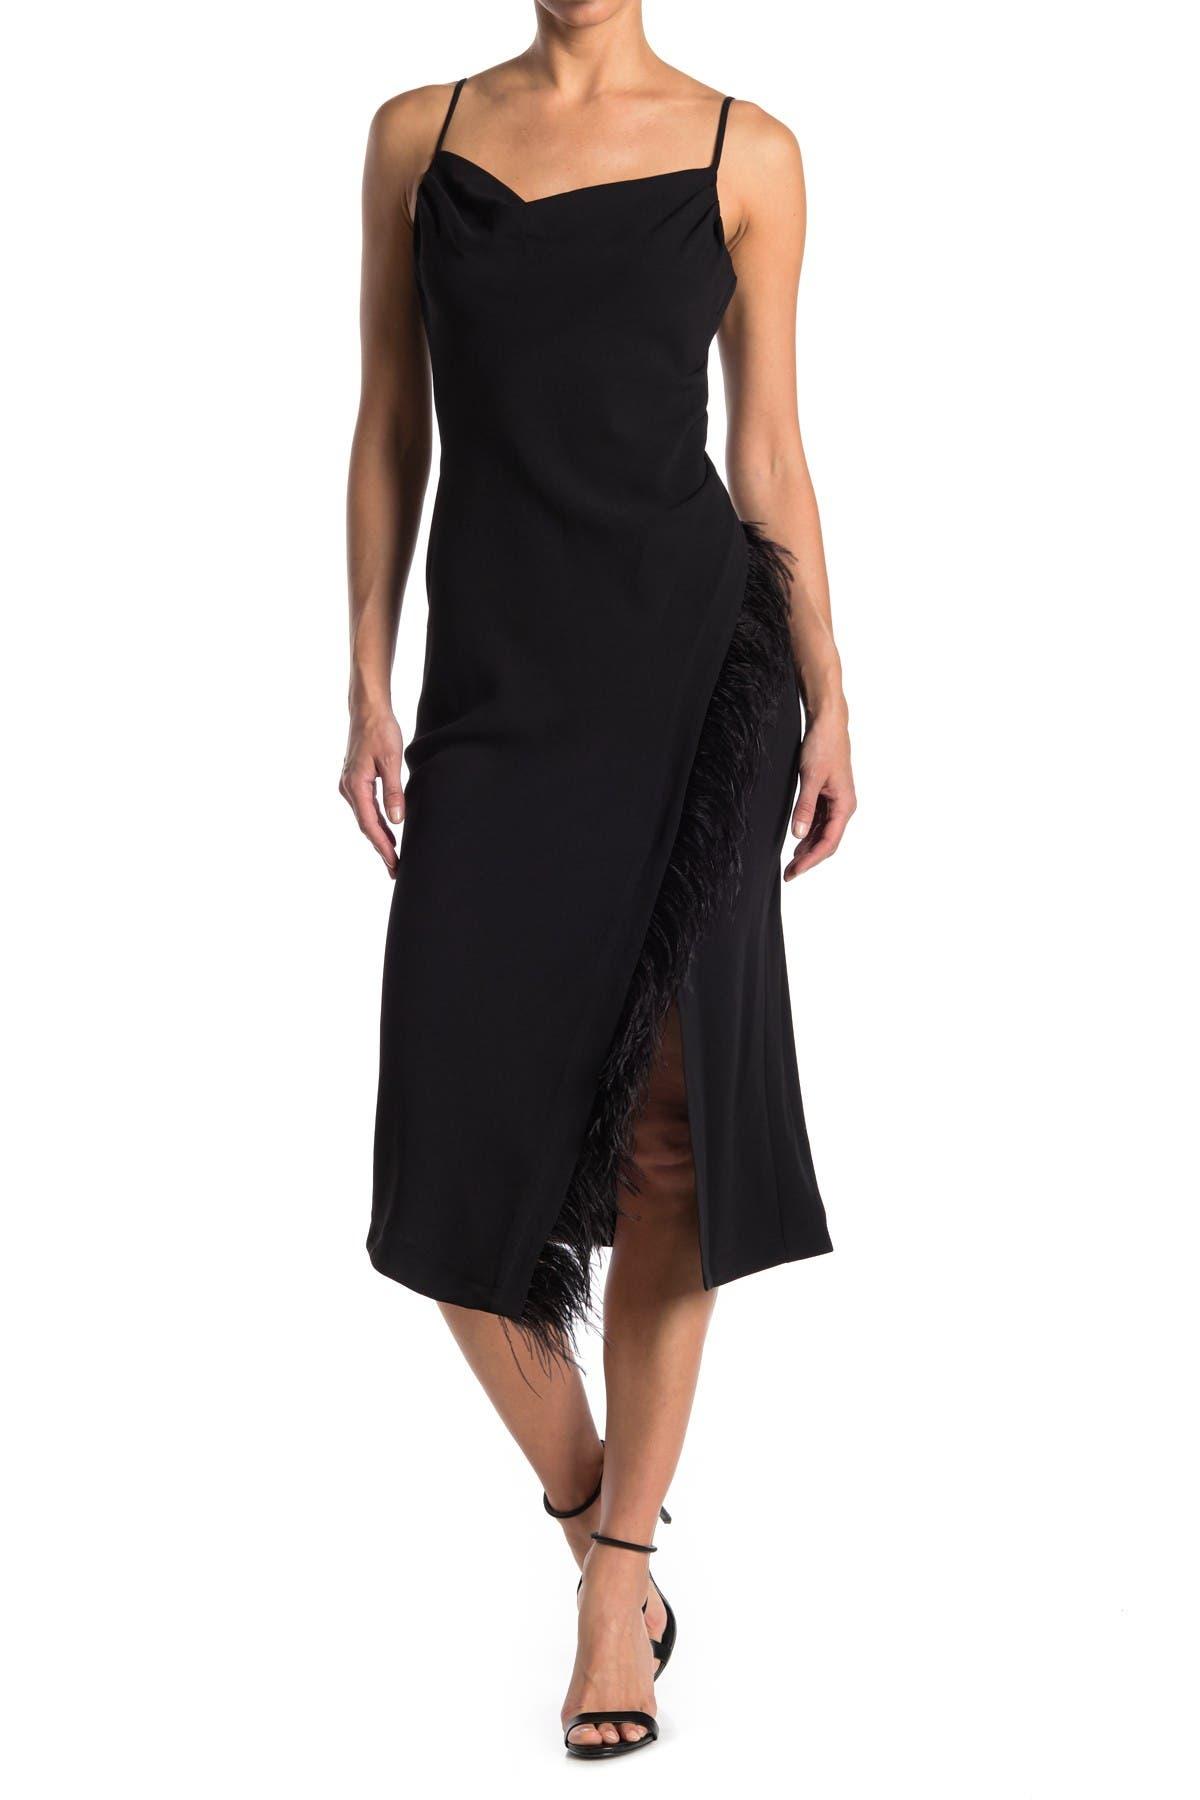 Image of DEREK LAM 10 CROSBY Nellie Cowl Neck Feather Hem Trim Midi Dress